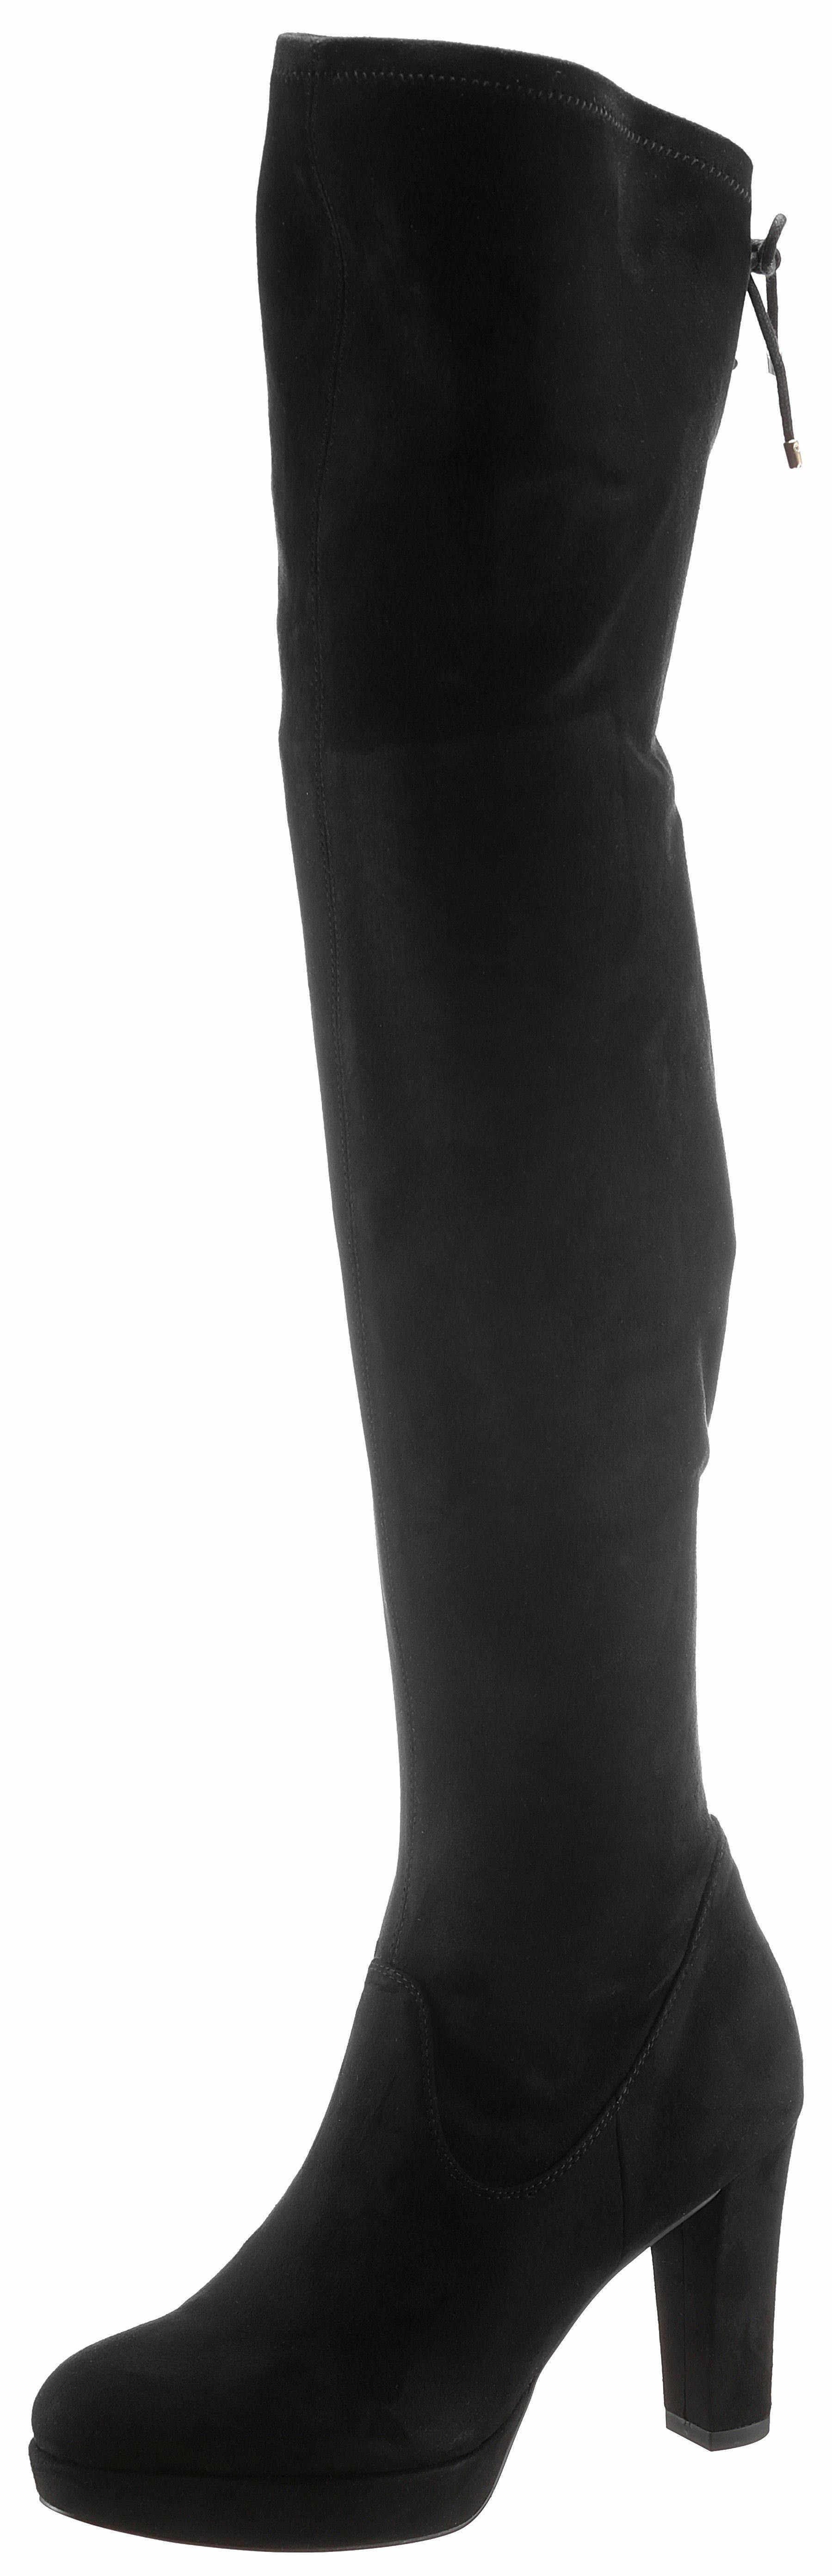 Tamaris Heart & Sole Overkneestiefel, mit XS-Schaft online kaufen  schwarz